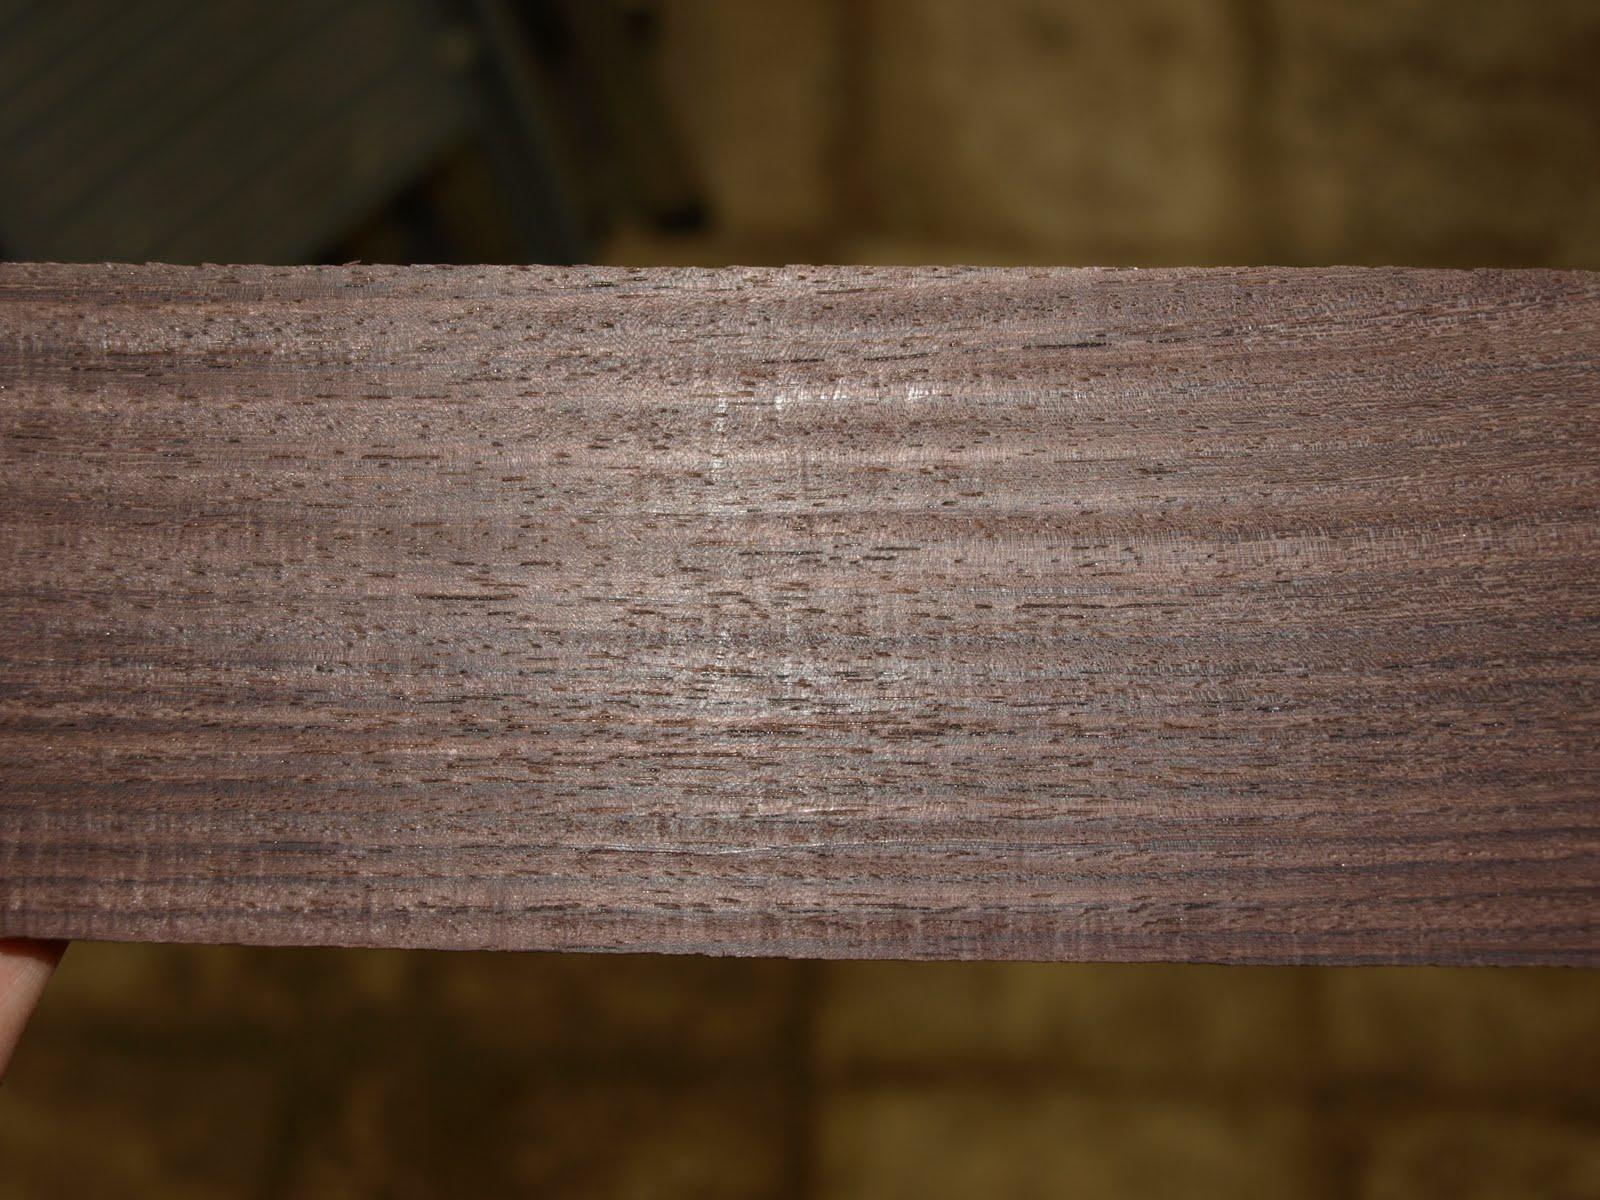 Fournisseur bois de lutherie, erable onde, frene # Kauffer Bois De Lutherie